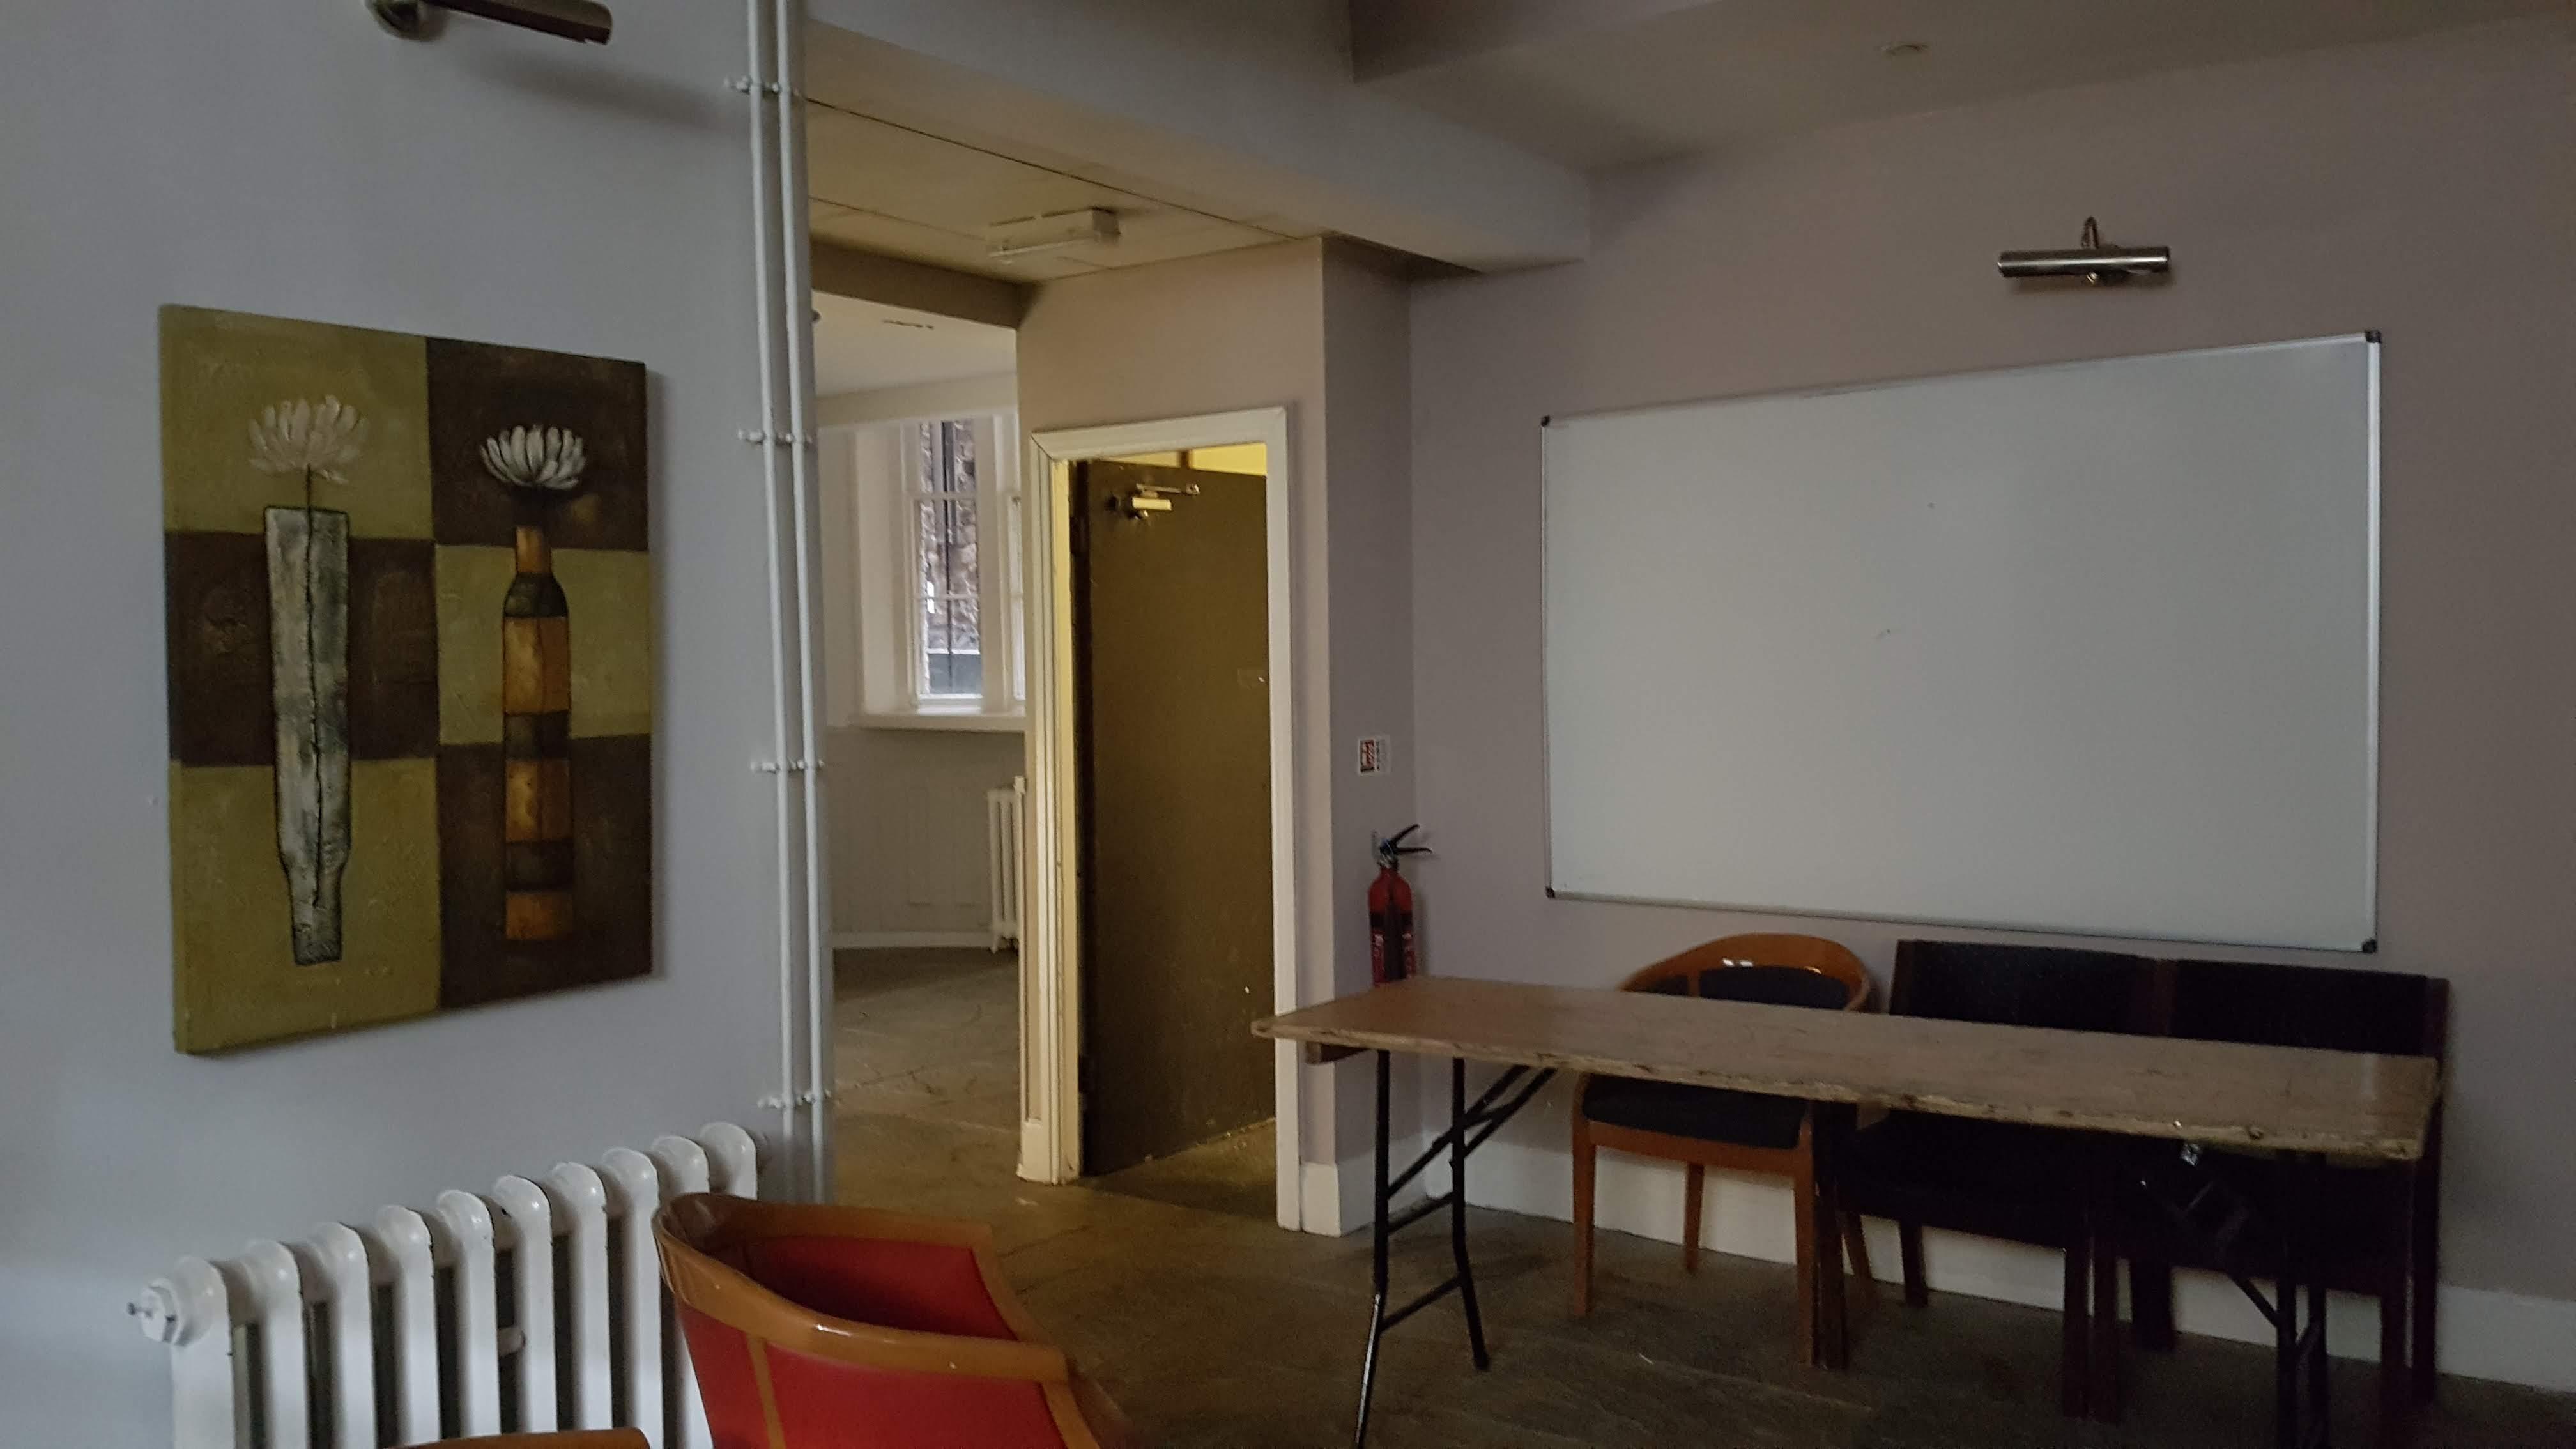 The Casa, Venue hire break out room